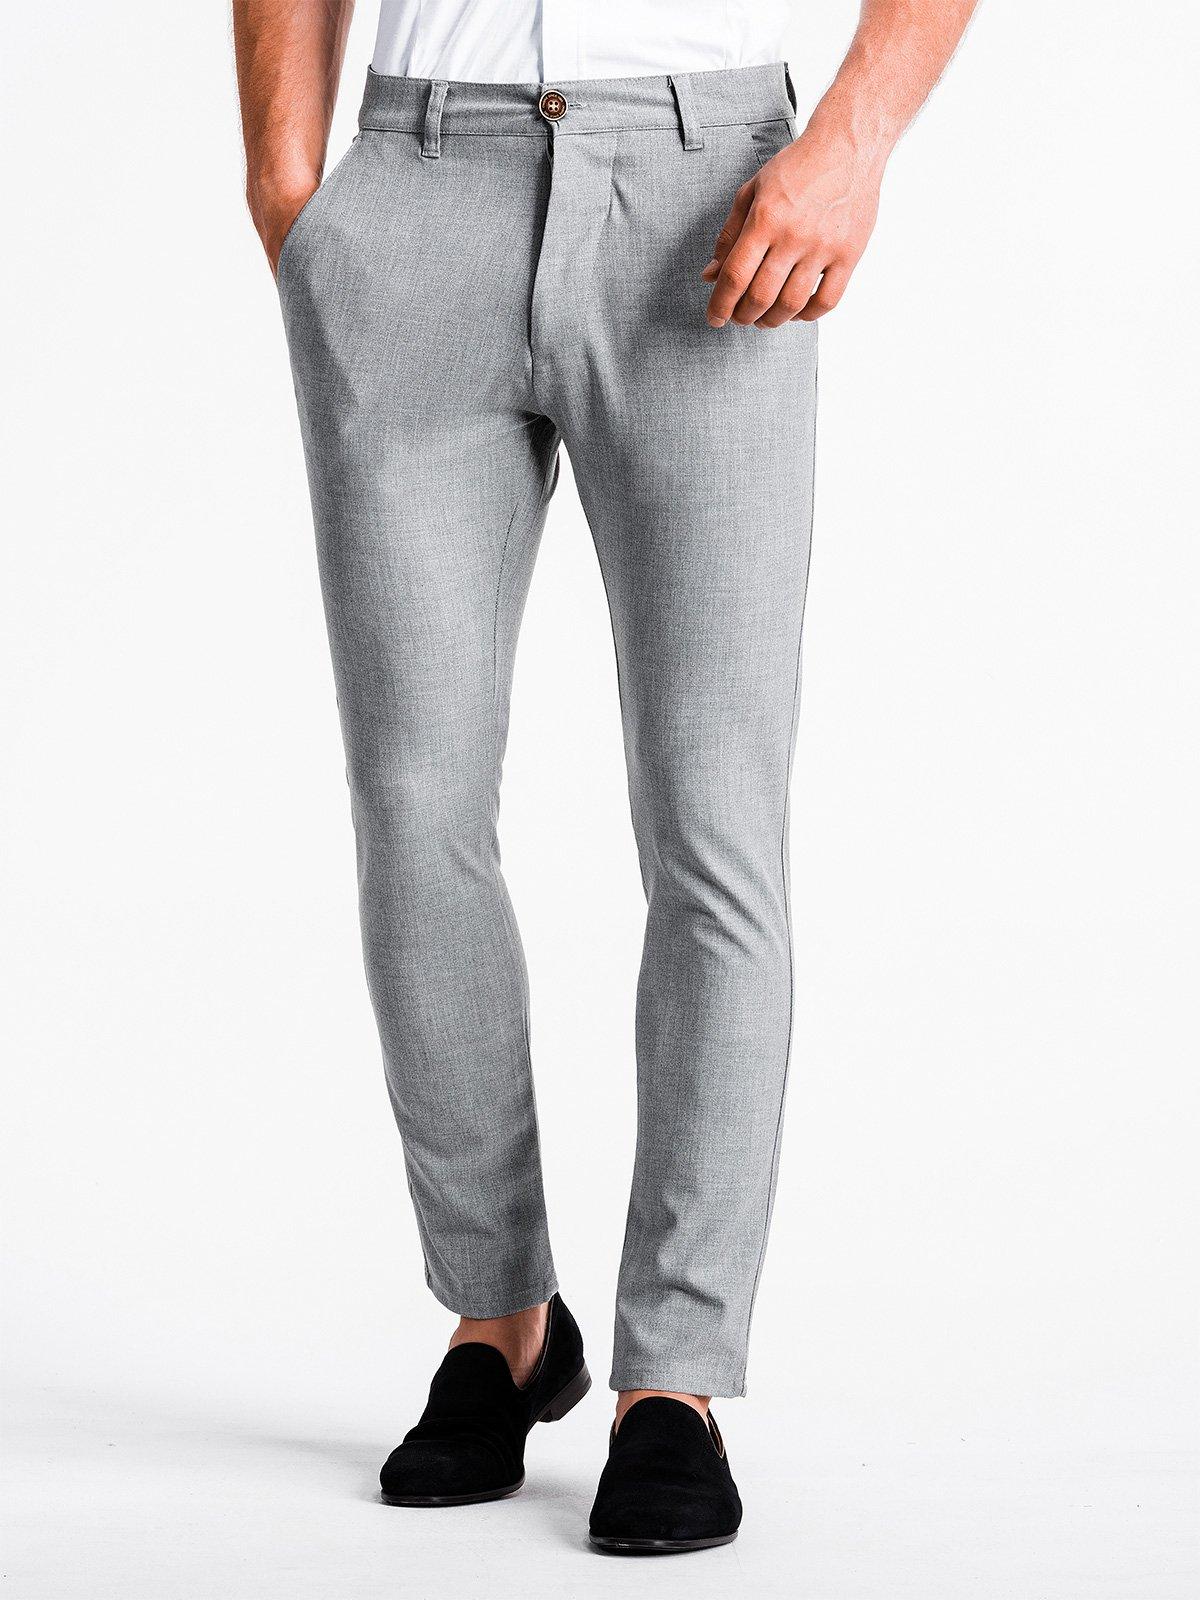 Spodnie męskie chino P832 - jasnoszare